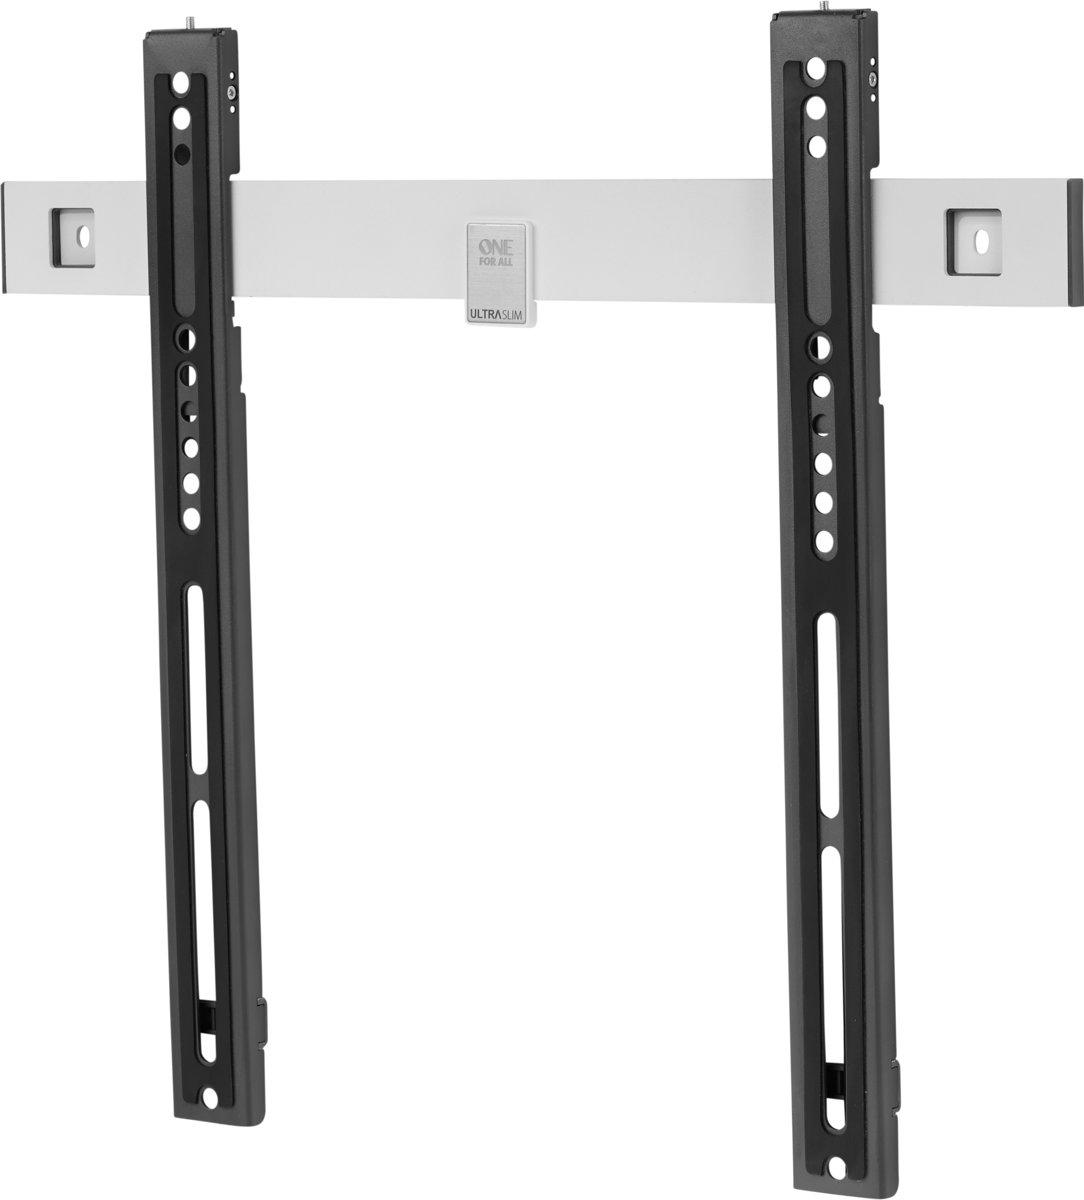 One For All WM6411 flat ultra-slim VESA 400 kopen